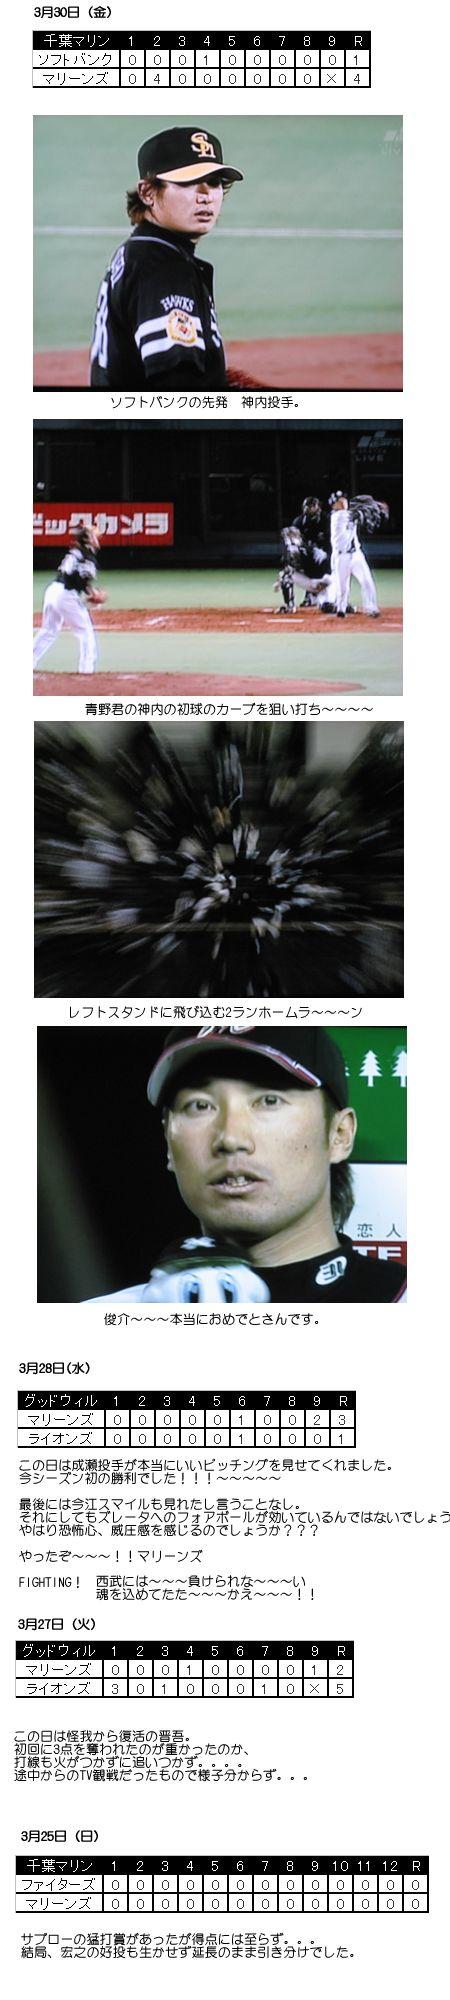 07-03-30-softbank.jpg